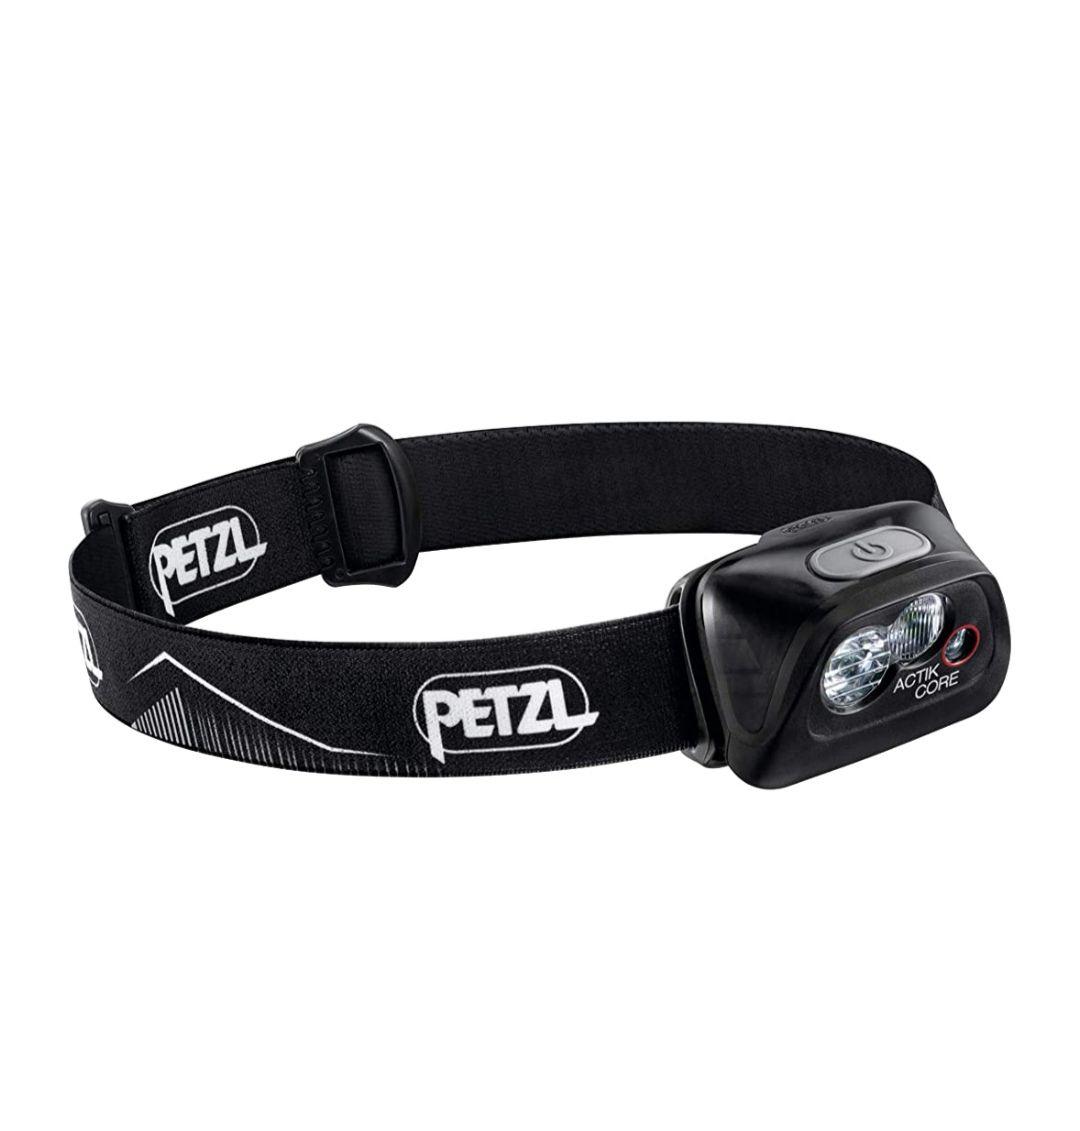 PETZL Actik Core Headlamp - SS21 £32 delivered @ Amazon